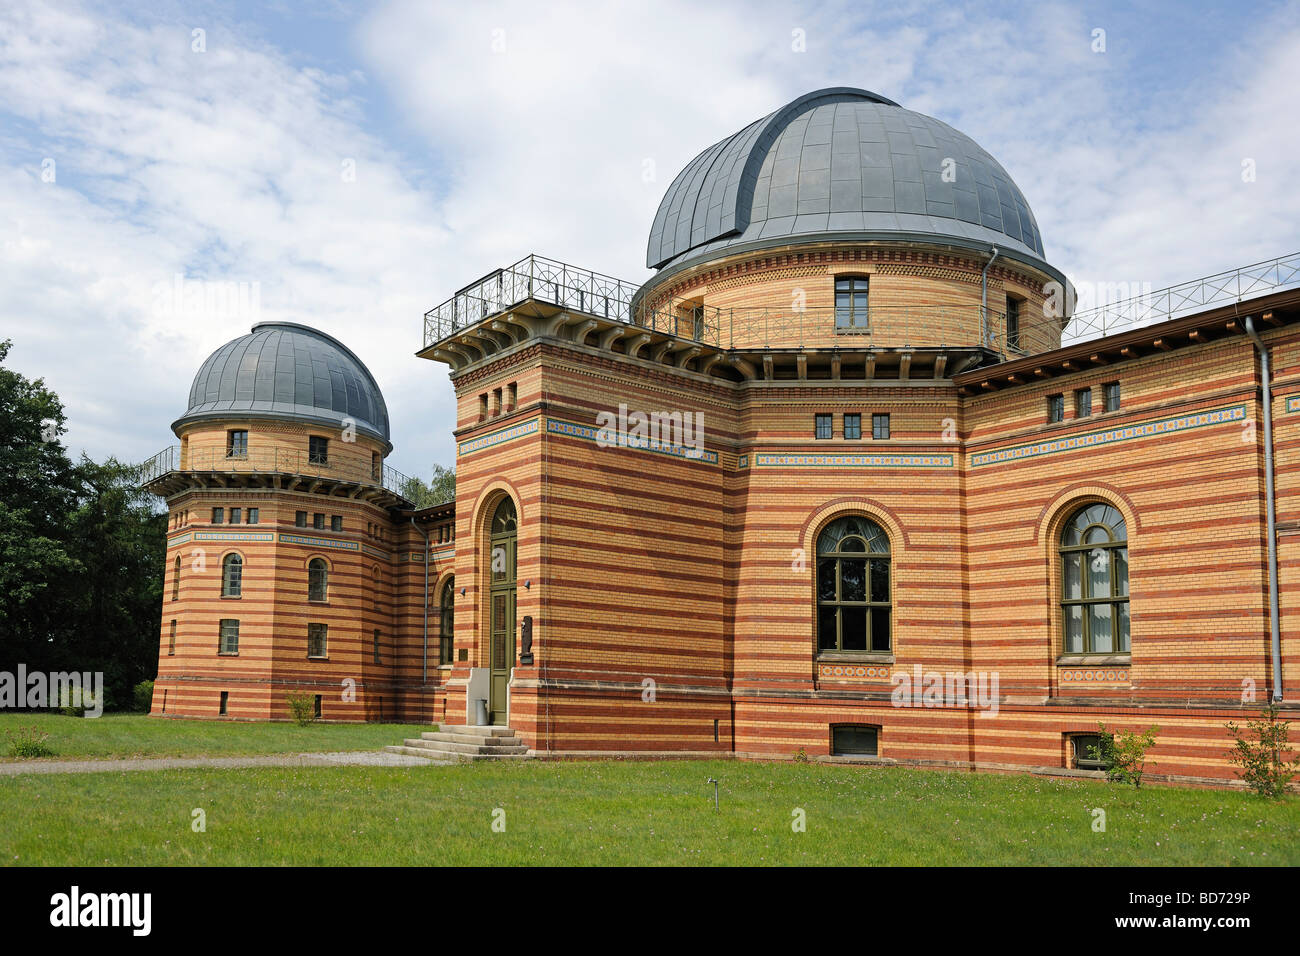 Domed building, Michelson Haus house, Potsdam Institute for Climate Impact Research, PIK, Potsdam, Brandenburg, Stock Photo